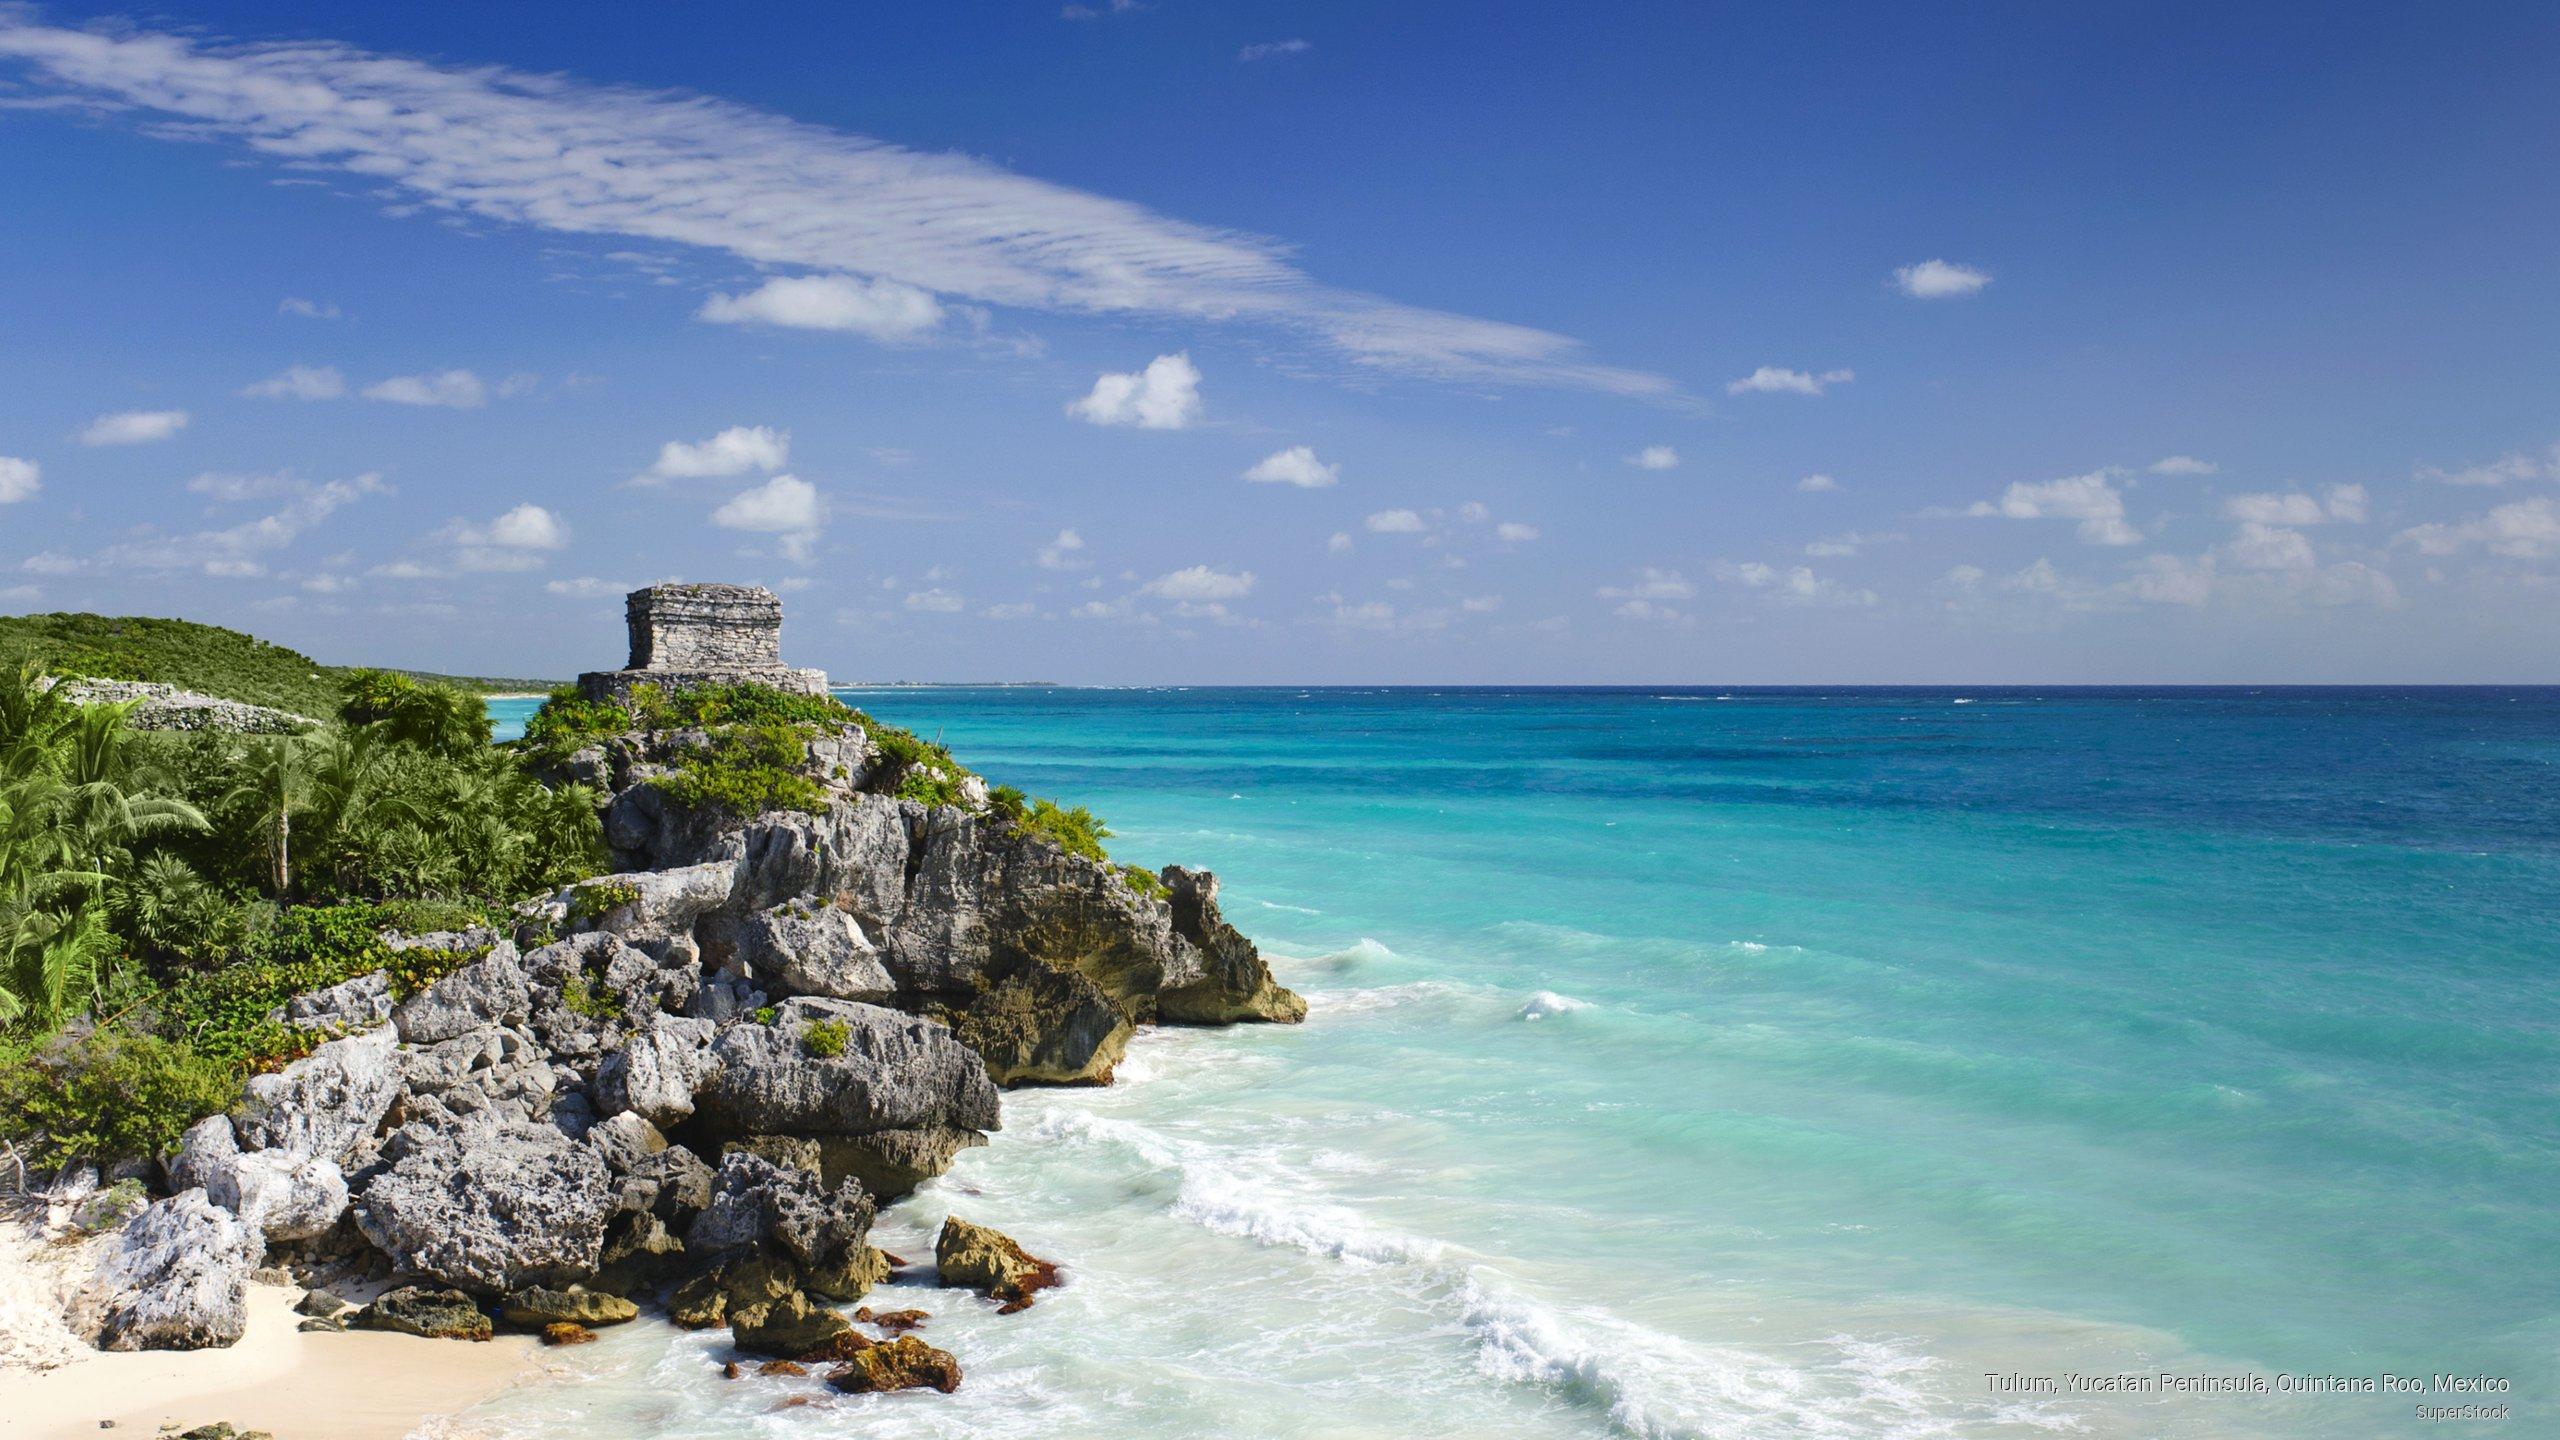 Webshots   Tulum Yucatan Peninsula Quintana Roo Mexico 2560x1440